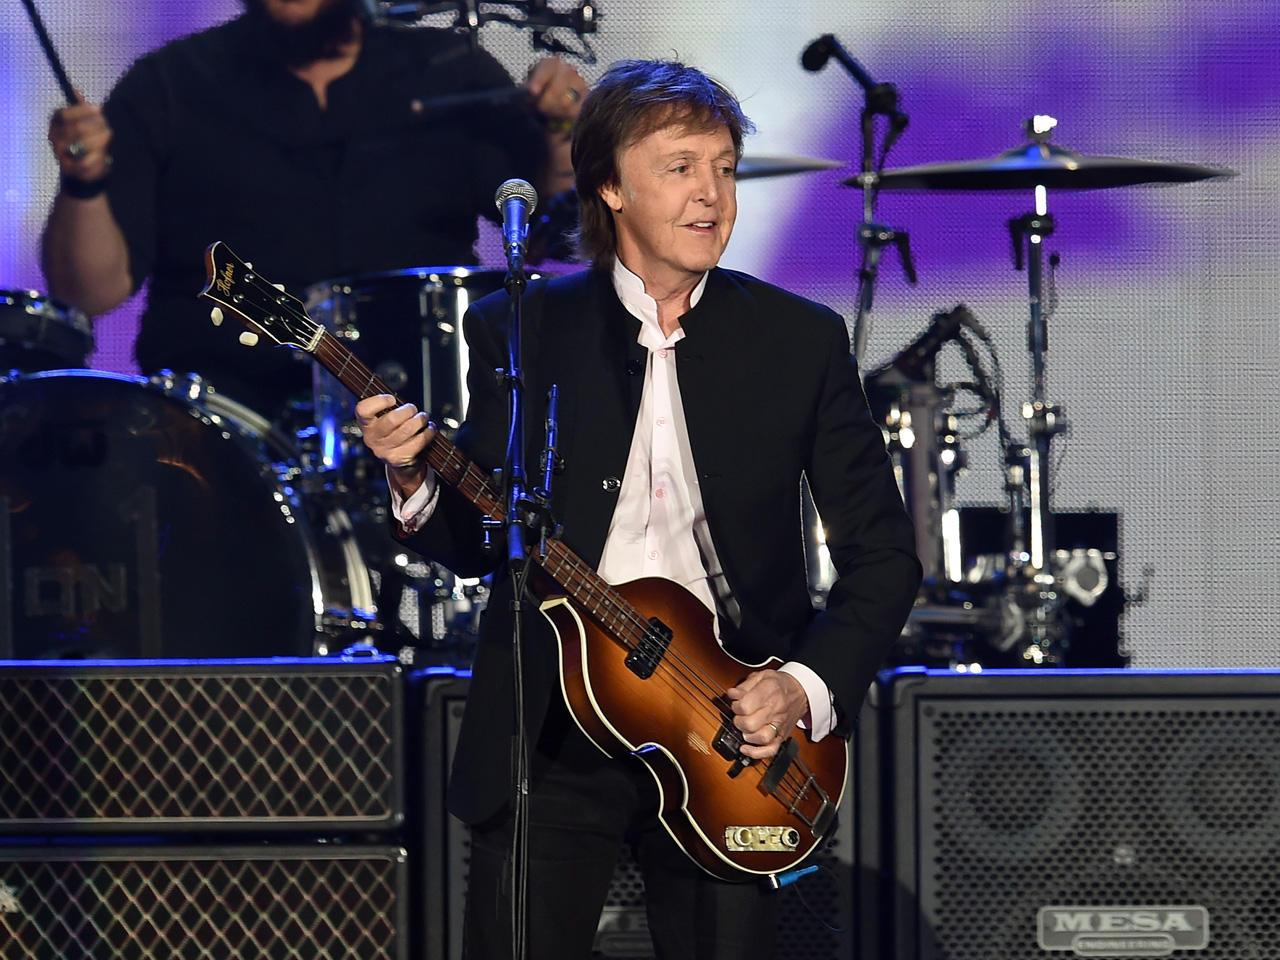 Paul McCartney, Metallica to headline Austin City Limits - CBS News